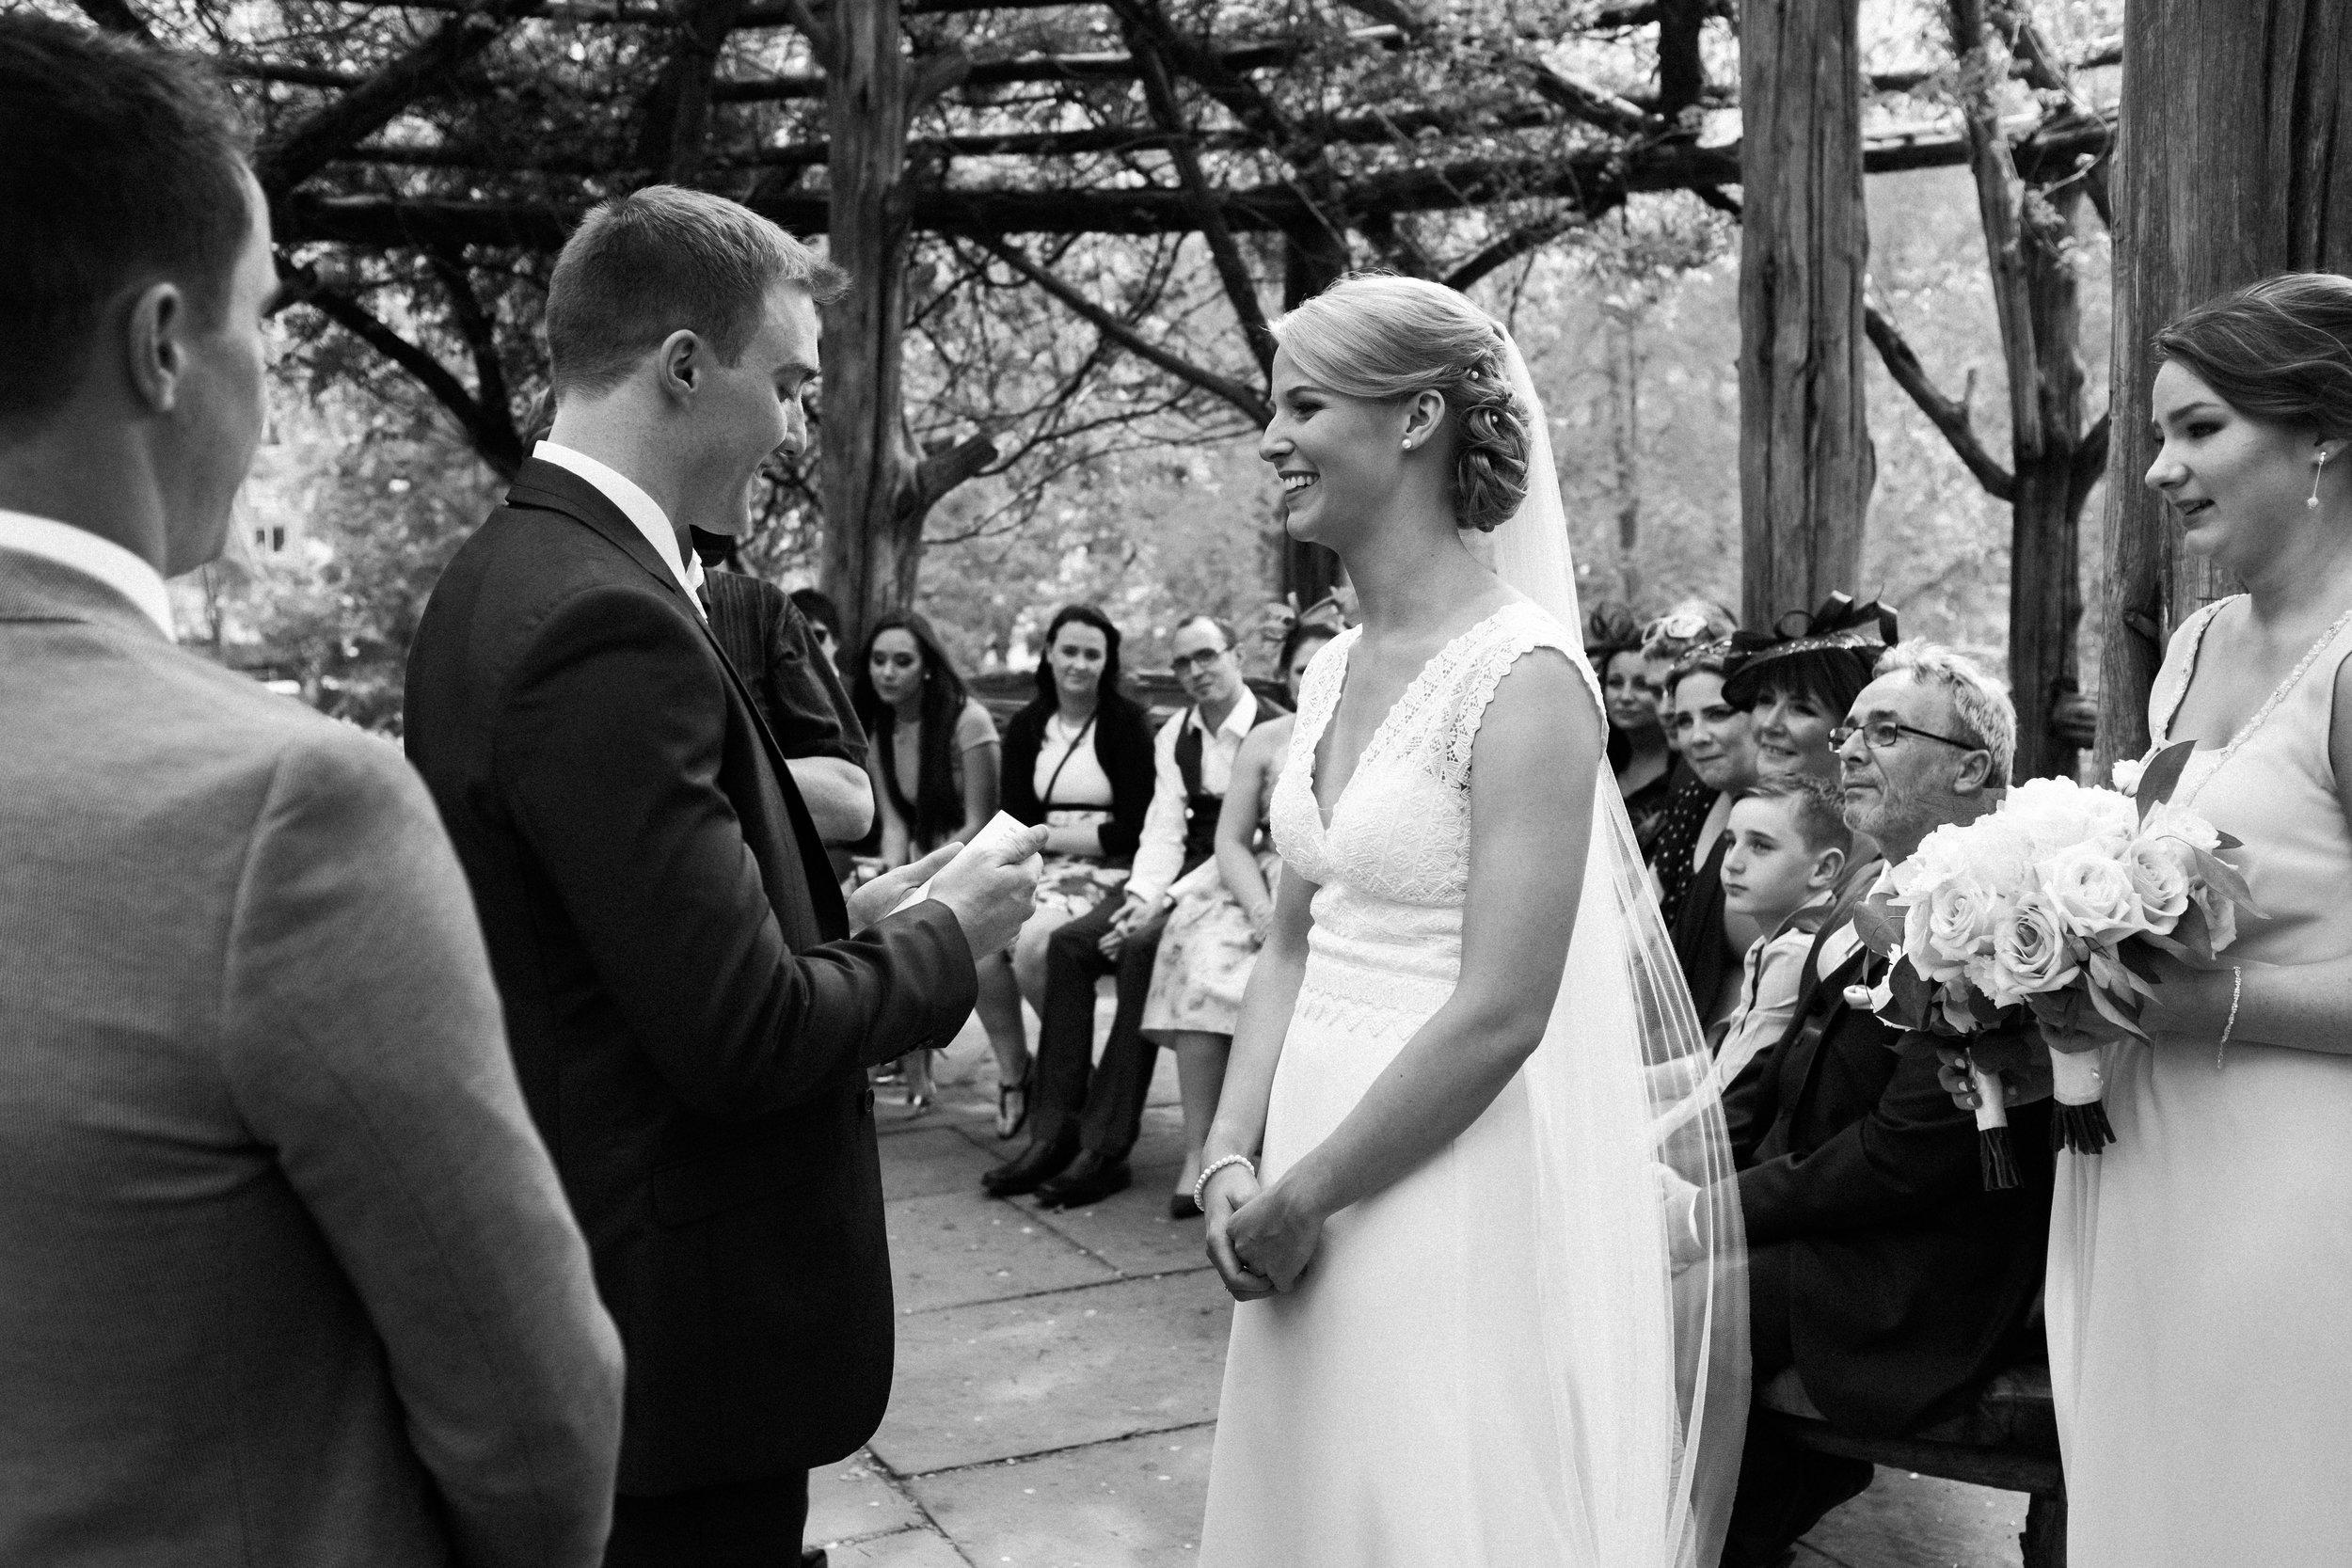 Cop Cot wedding ceremony